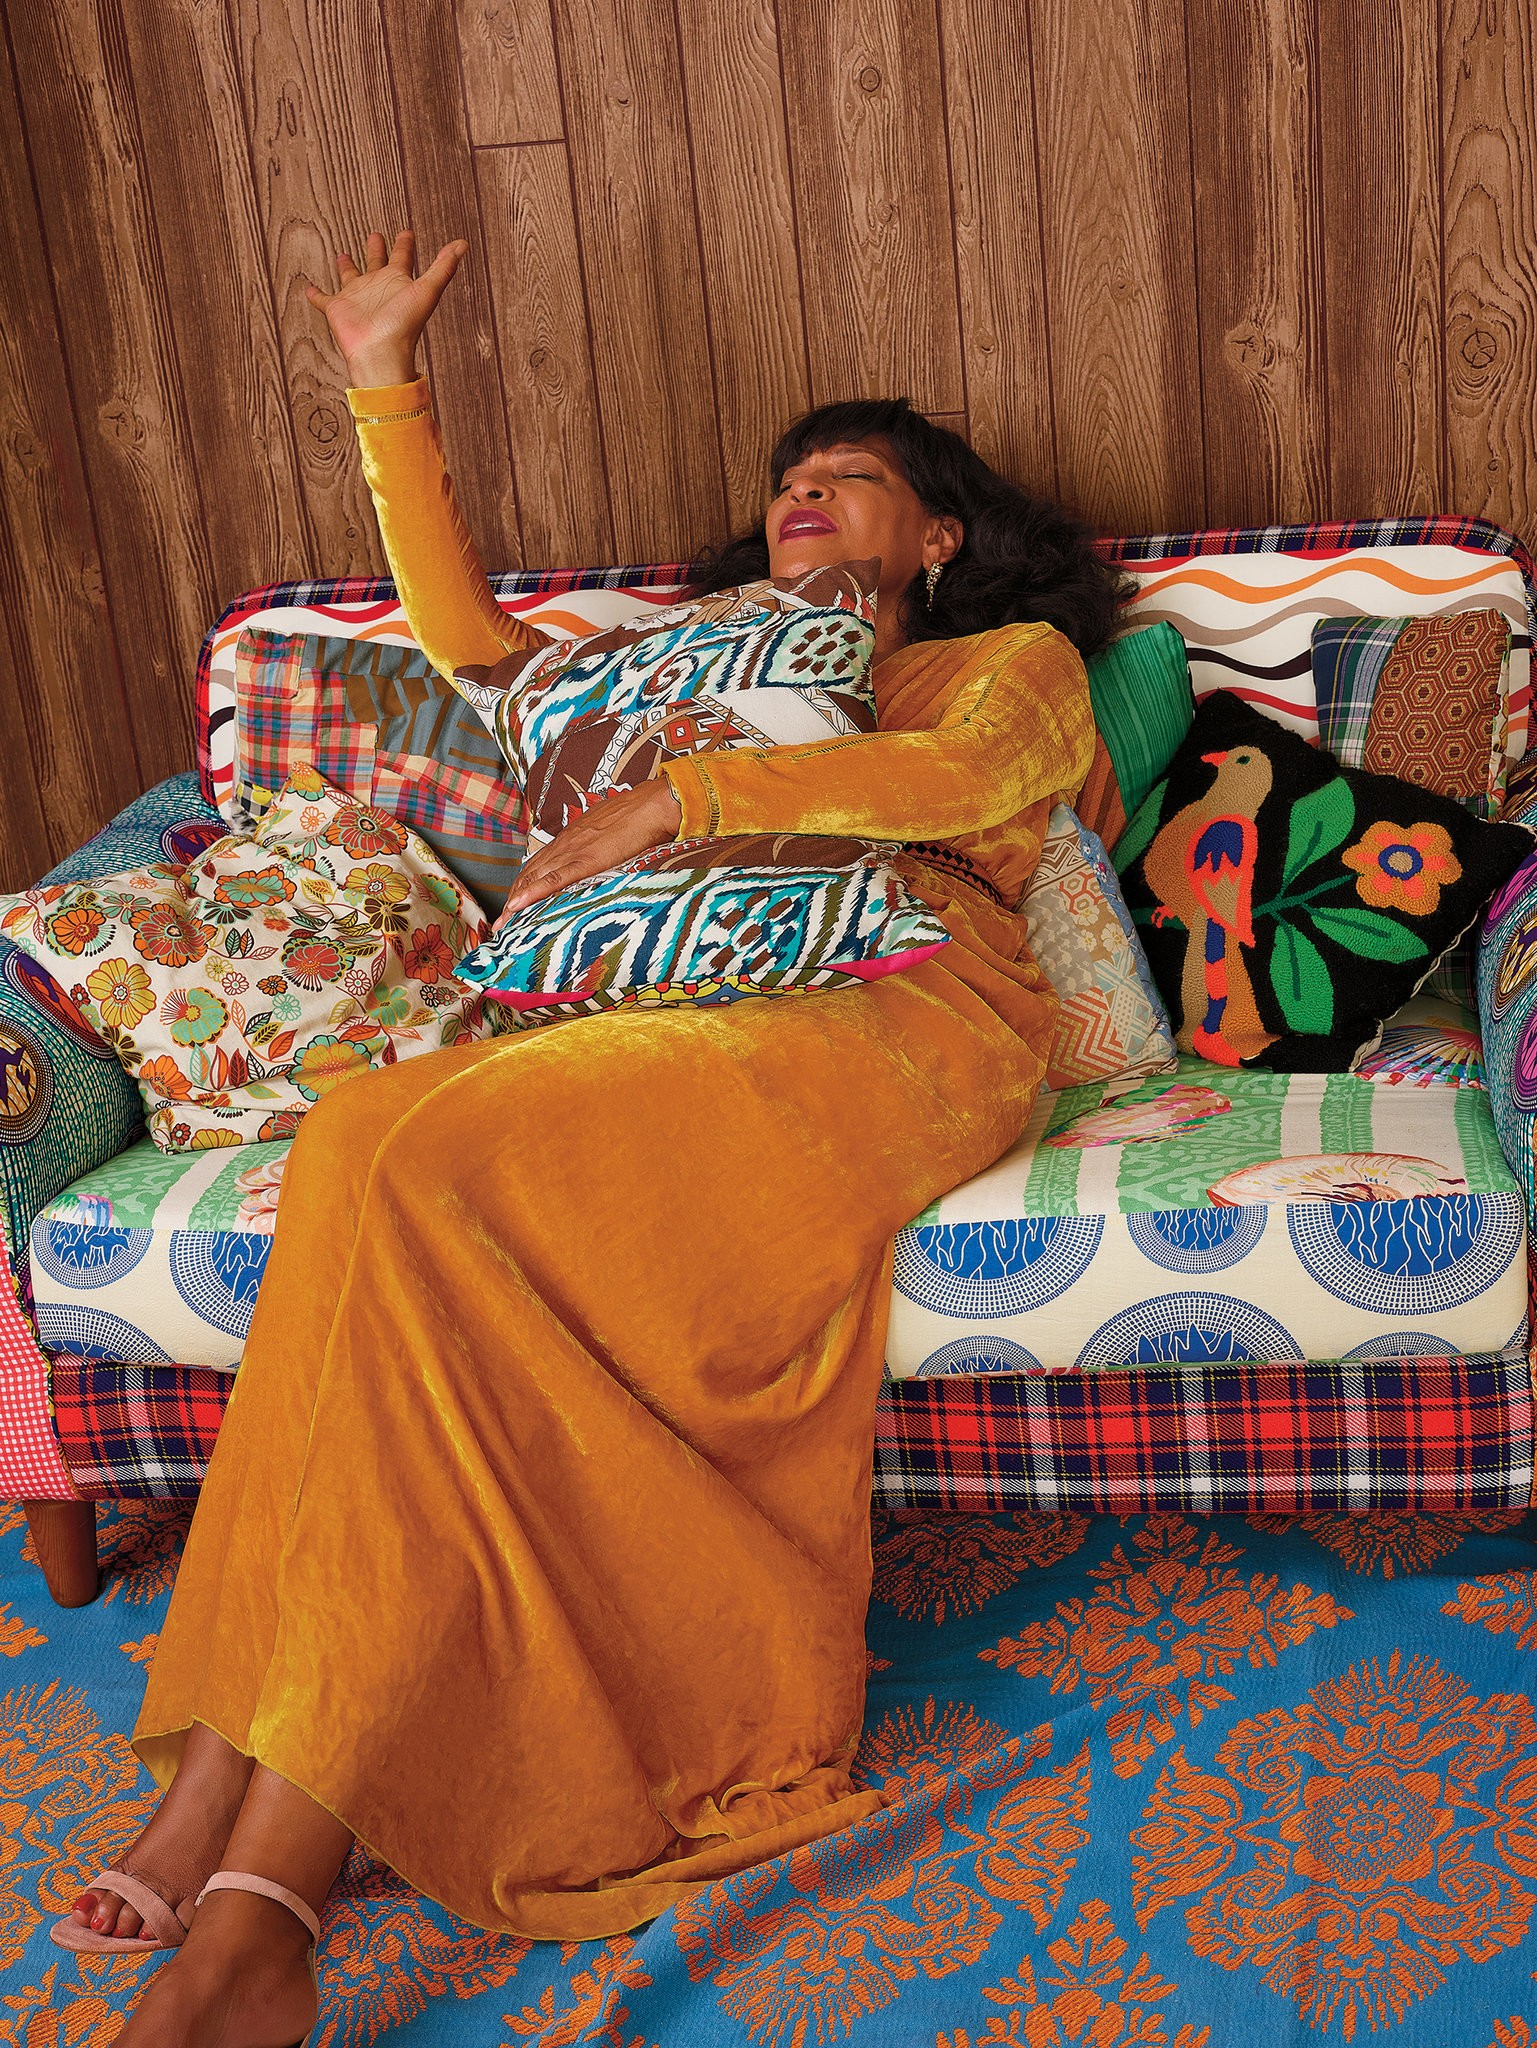 Carrie Mae Weems, African American Photography, Black Photography, KOLUMN Magazine, KOLUMN, KINDR'D Magazine, KINDR'D, Willoughby Avenue